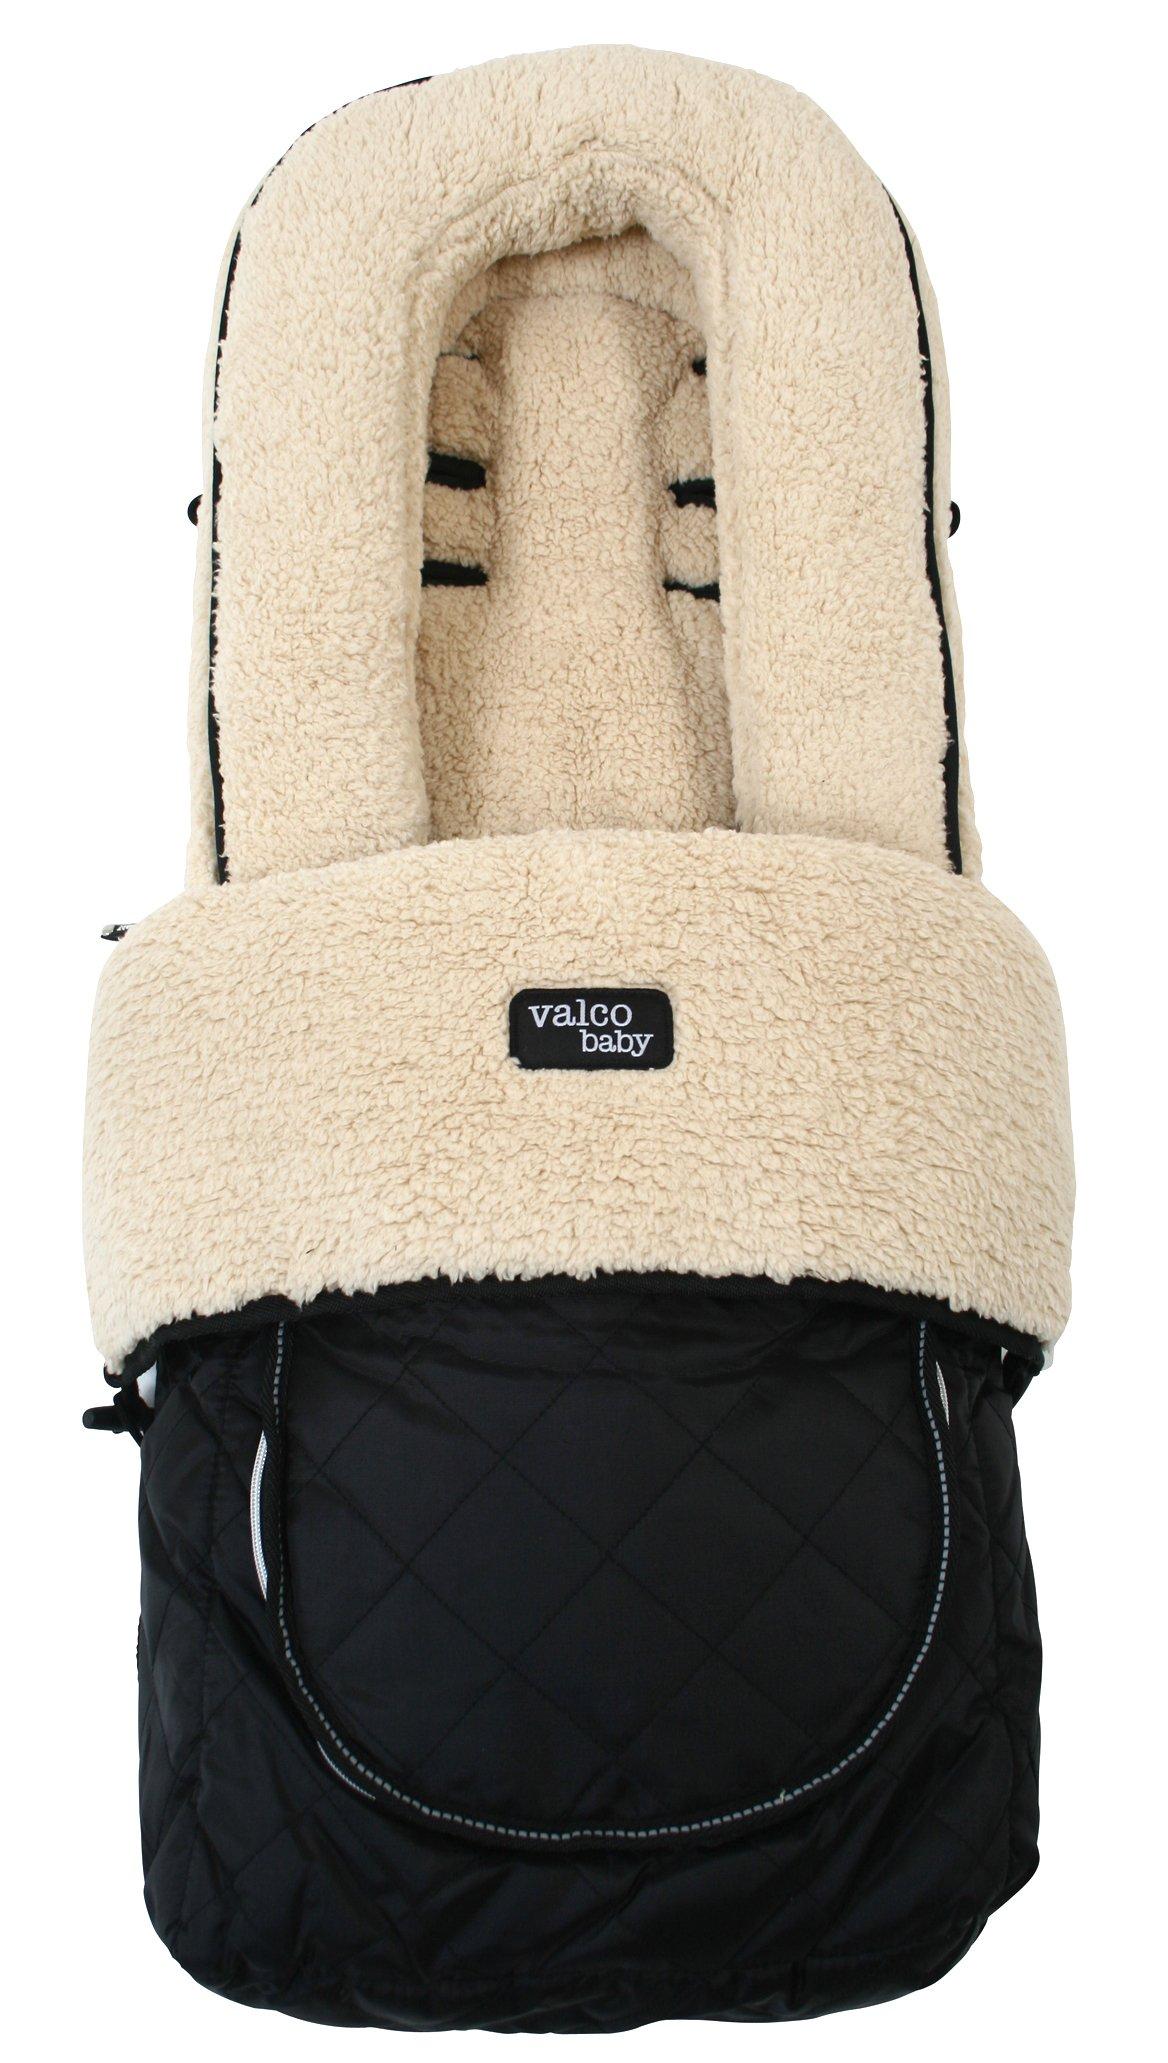 Valco Baby Universal Deluxe Fleece Foot Muff (Fluffly Fleece) by valco baby (Image #1)